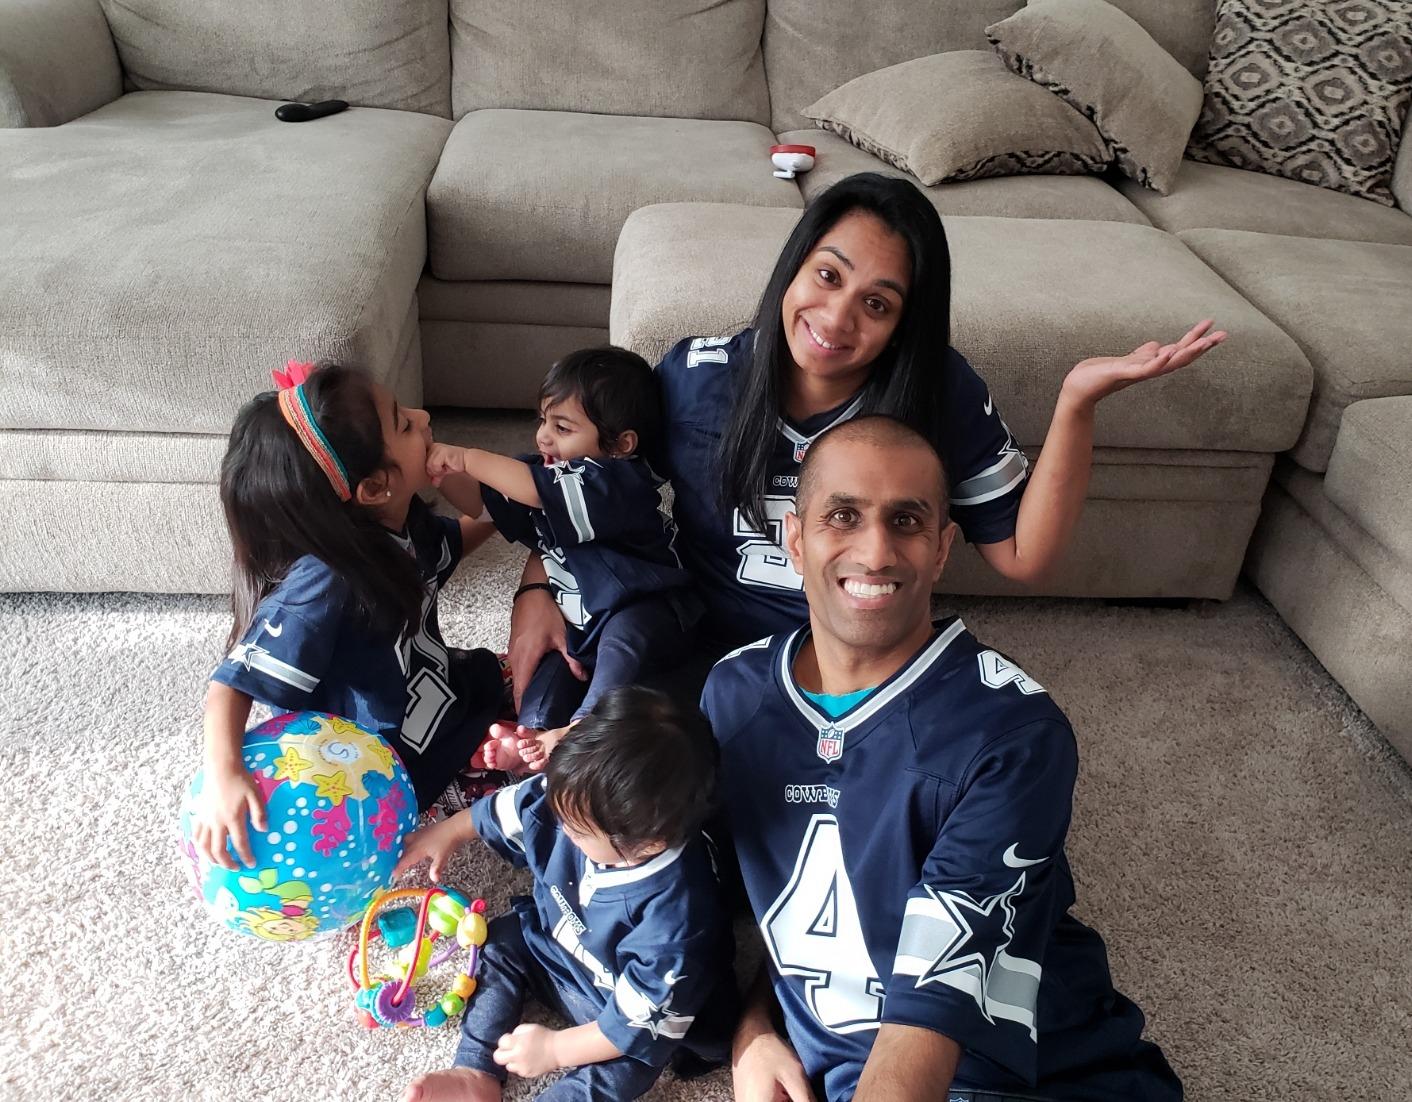 The Desai Family in Cowboys attire in the living room